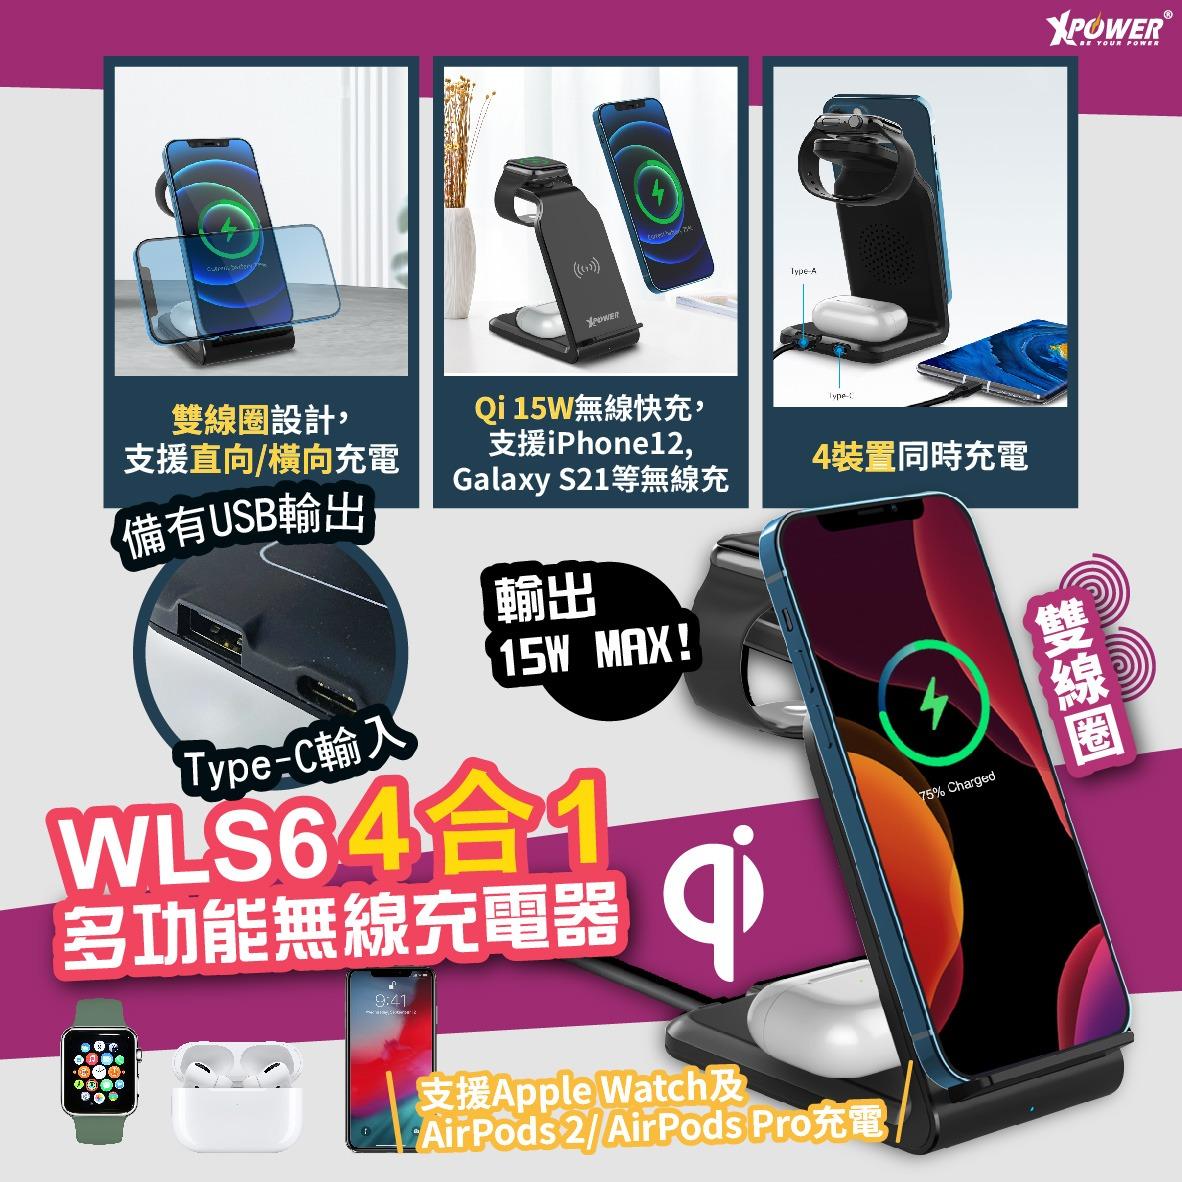 Xpower WLS6 4合1多功能15W無線充電器